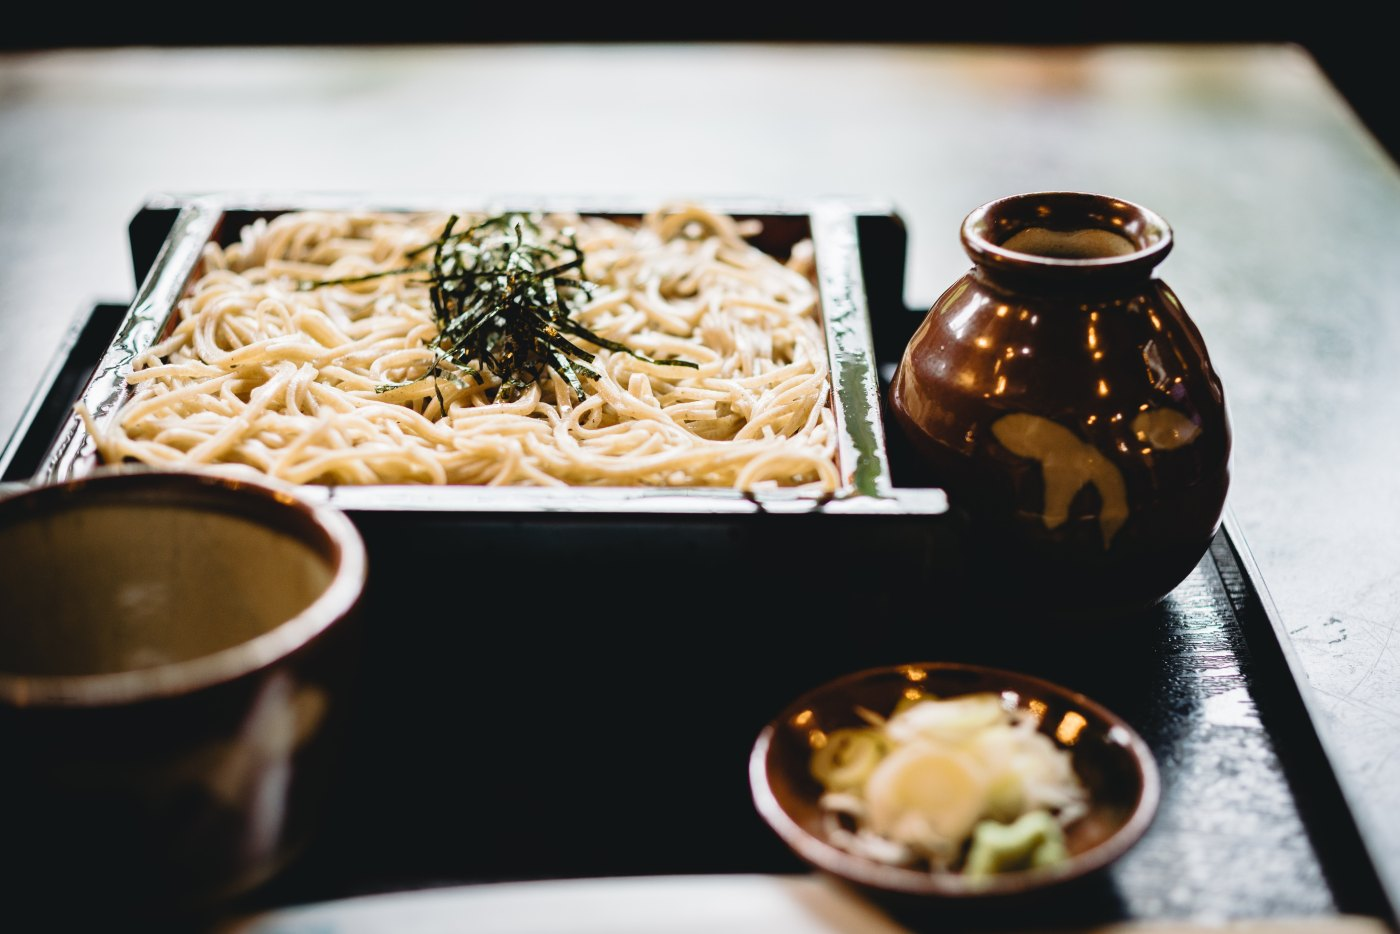 masaaki-komori-580552-unsplash